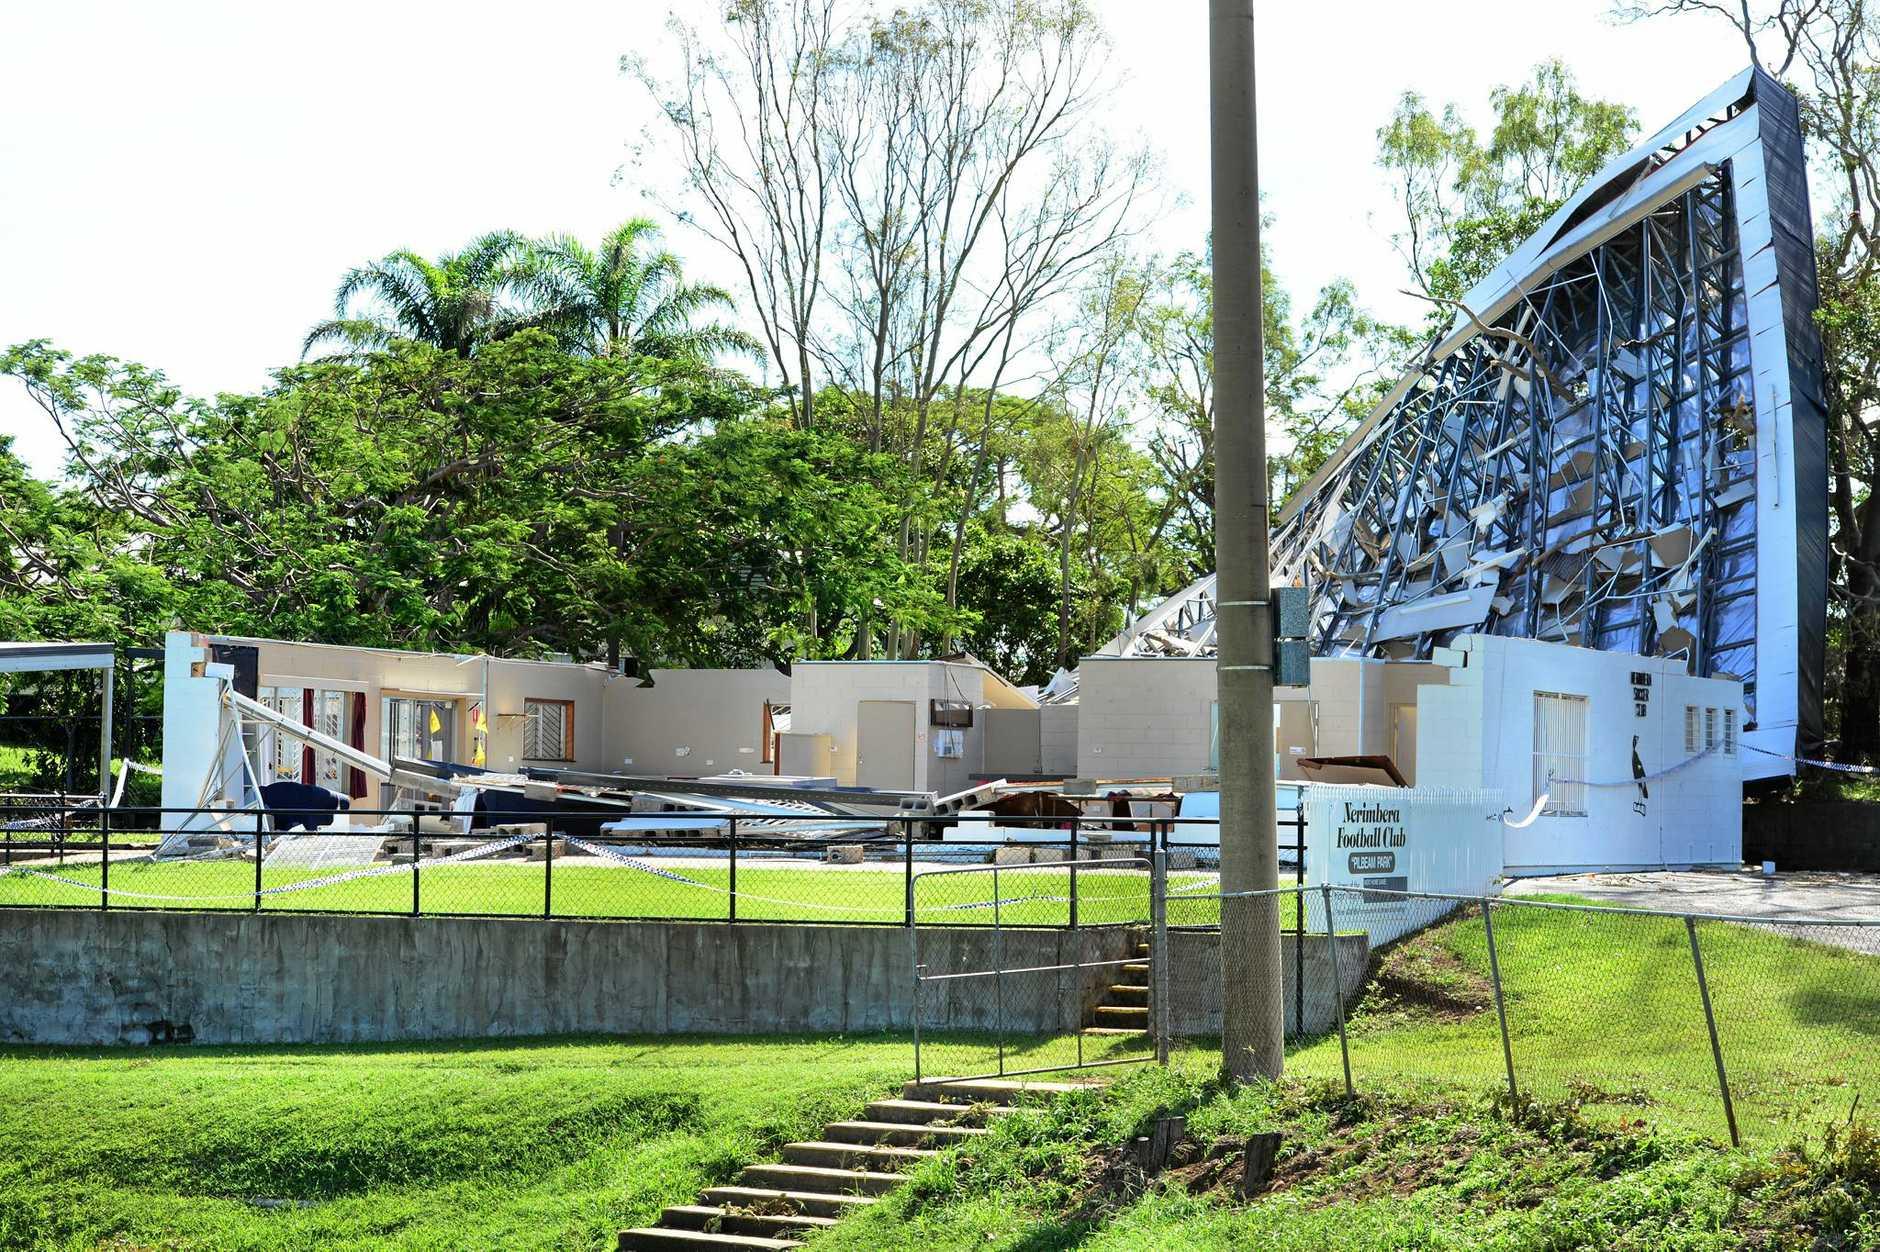 Nerimbera Soccer club lots its roof during Cyclone Marcia.  Photo Sharyn O'Neill / Morning Bulletin